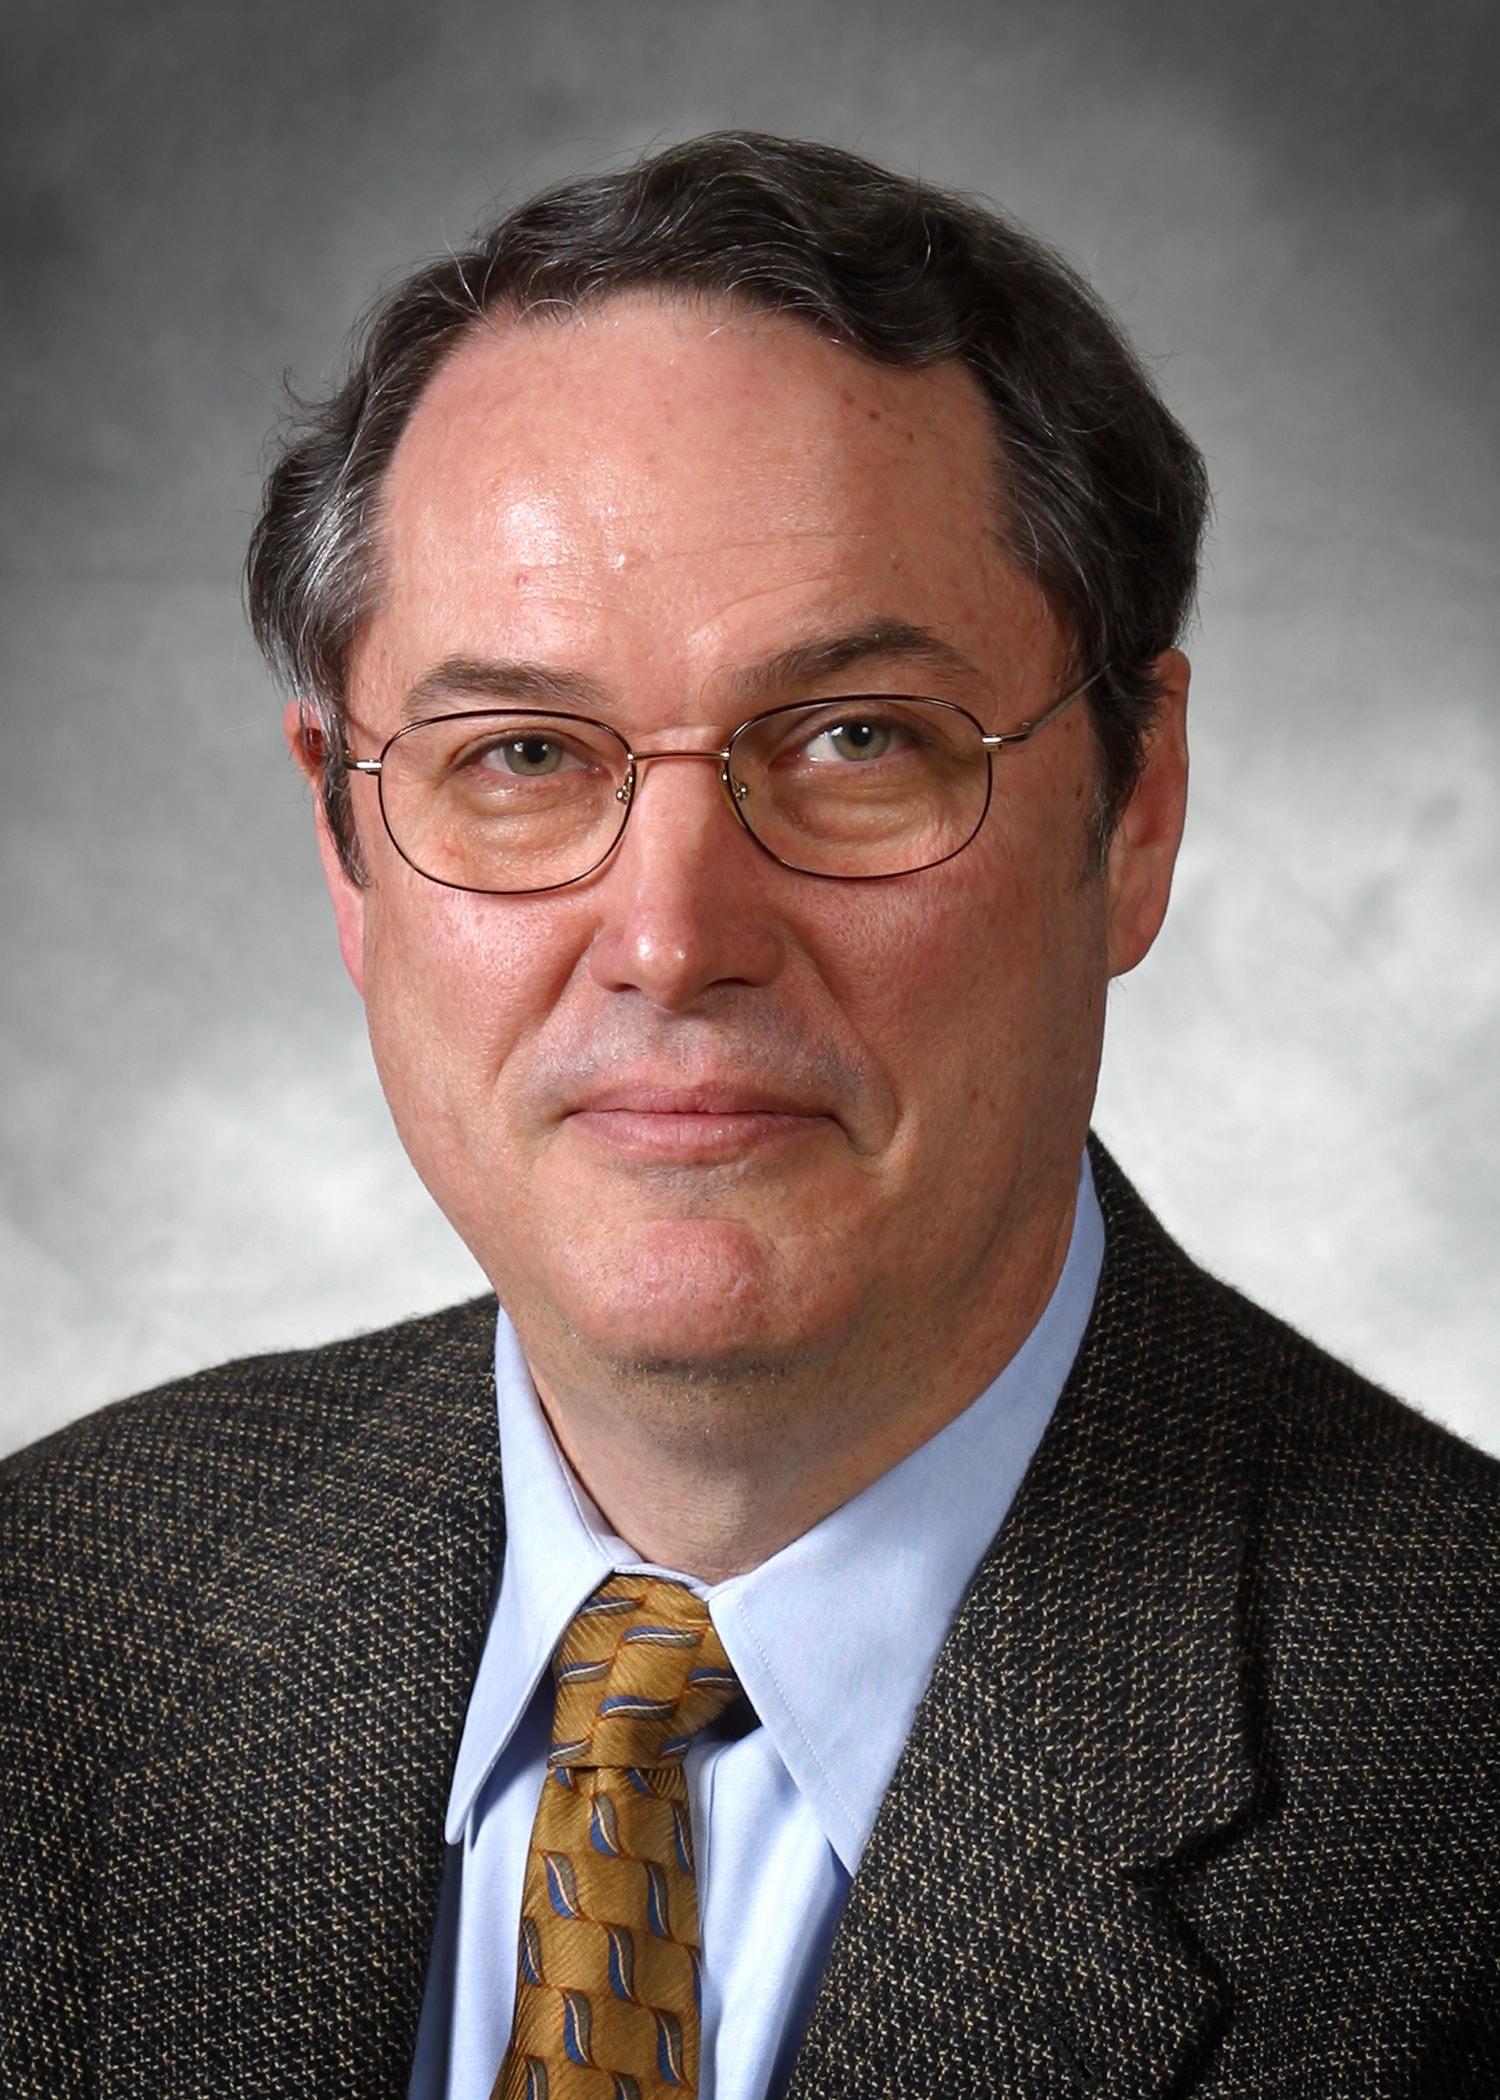 Daniel Cooperman, MD